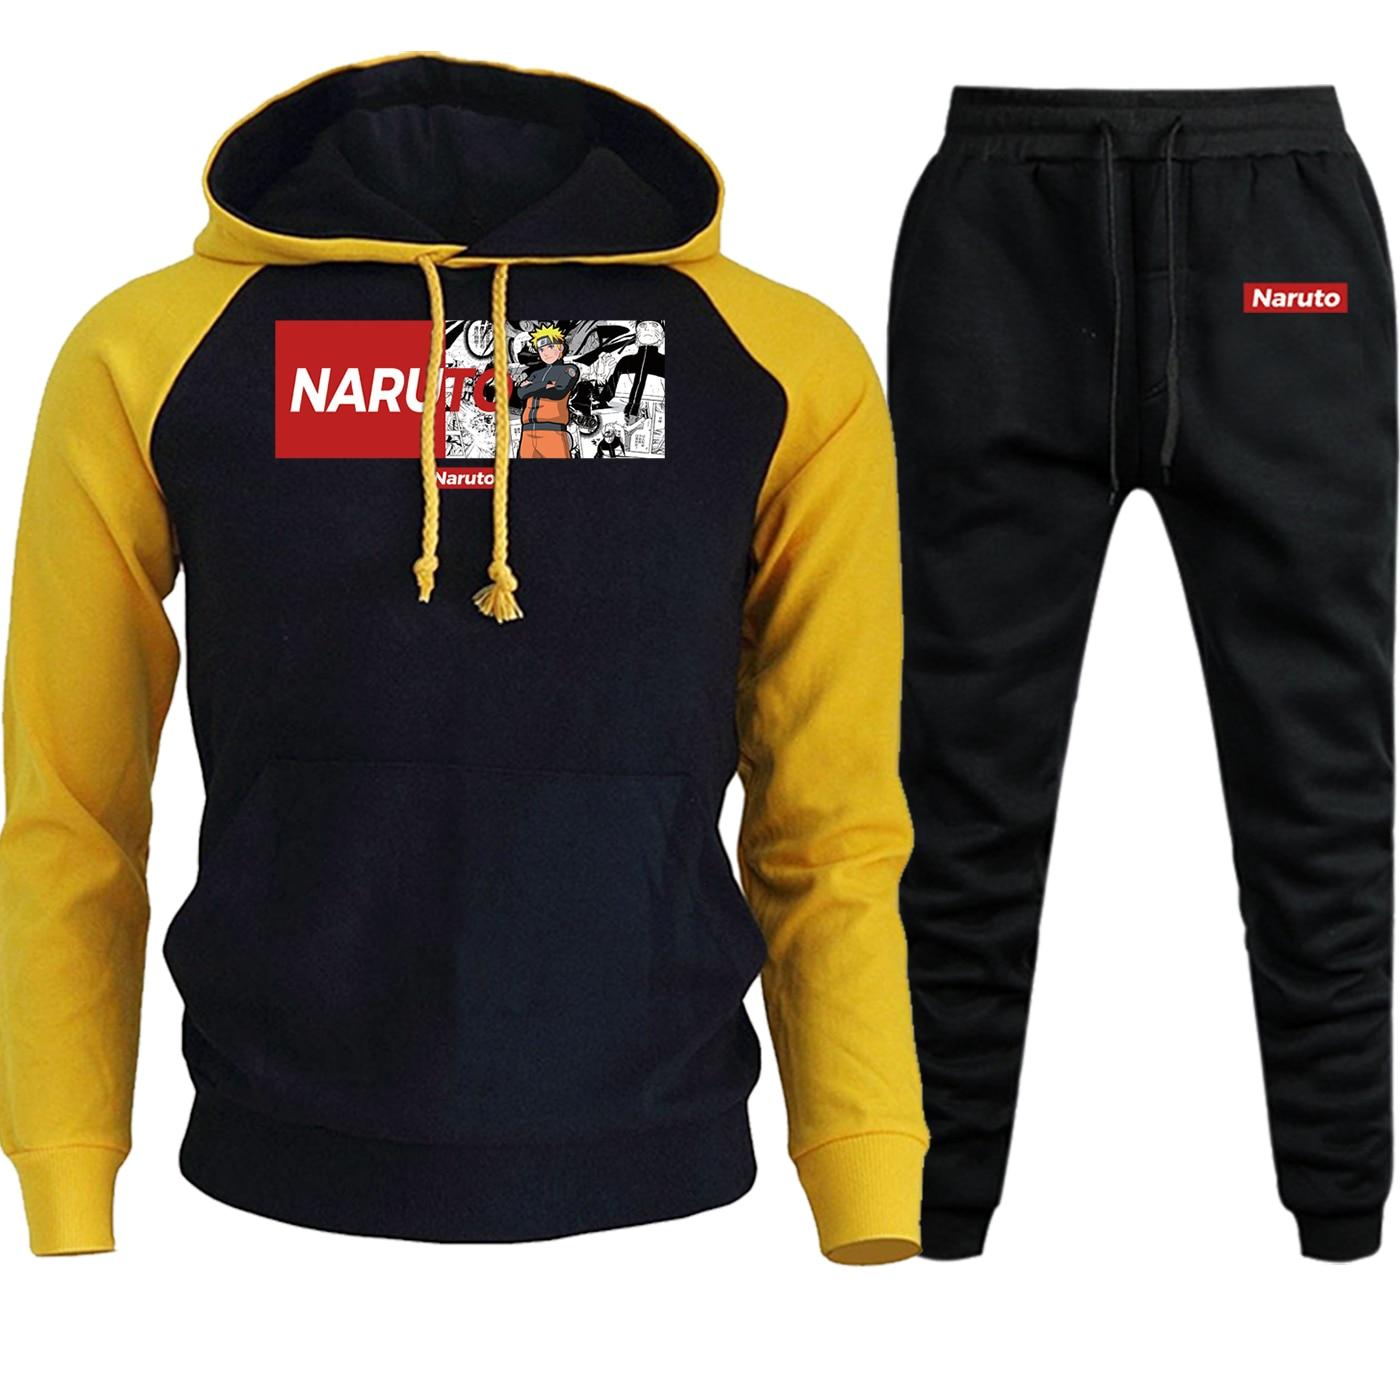 Naruto Streetwear Mens Hooded 2019 Autumn Winter Cartoon Pullover Suit Fleece Hoodie Raglan Fashion Sweatshirt+Pants 2 Piece Set